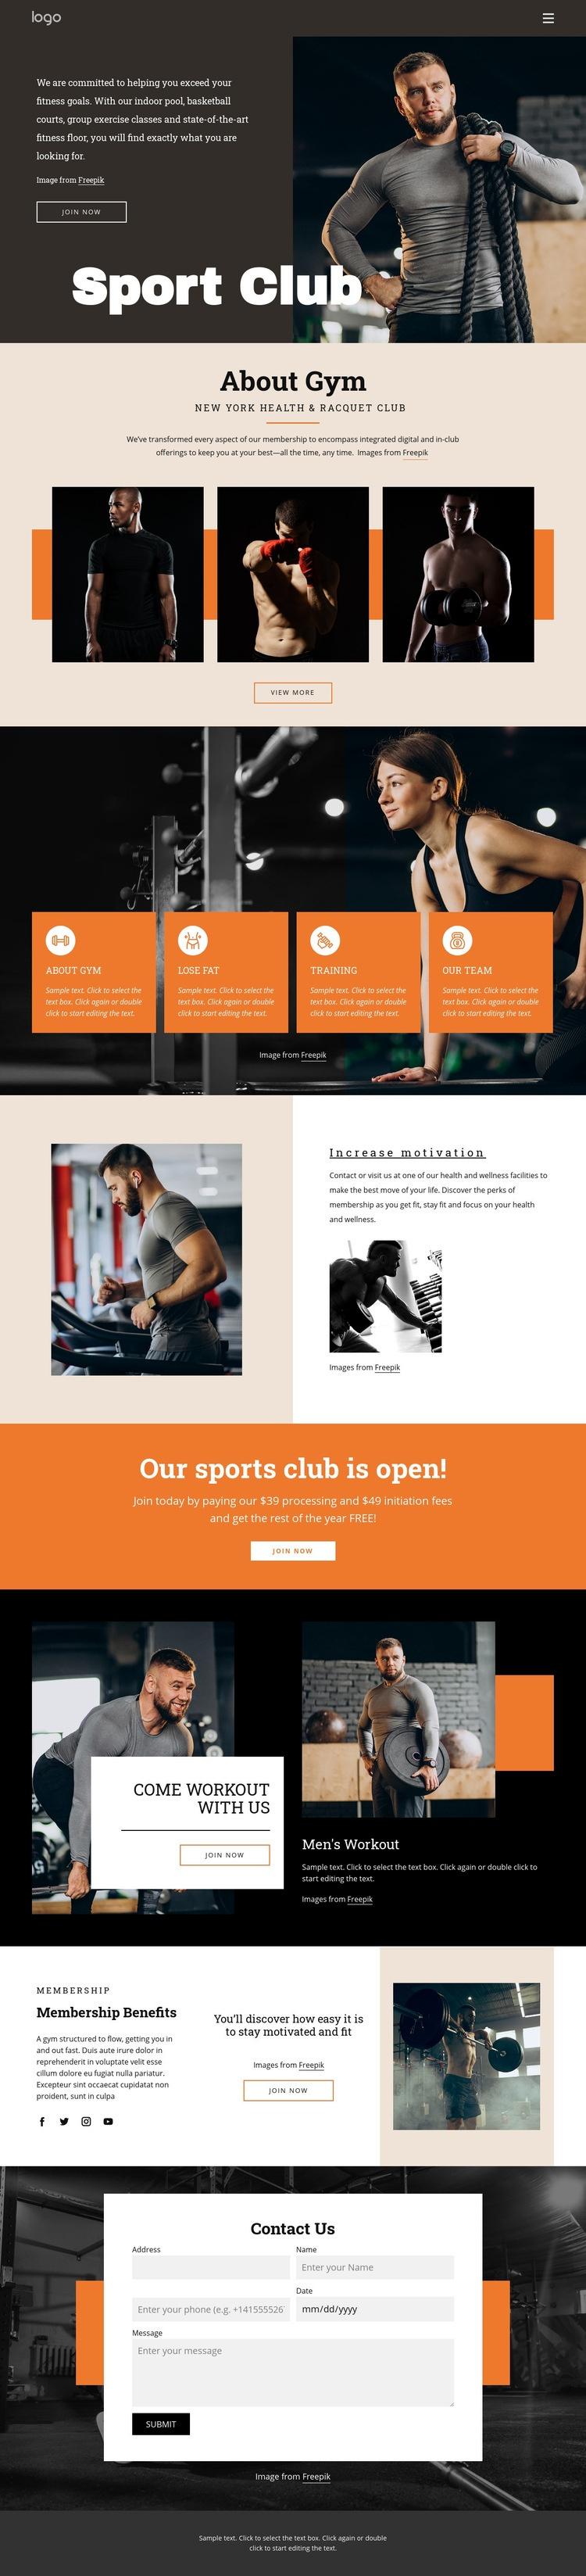 Convenient personal training programs Homepage Design